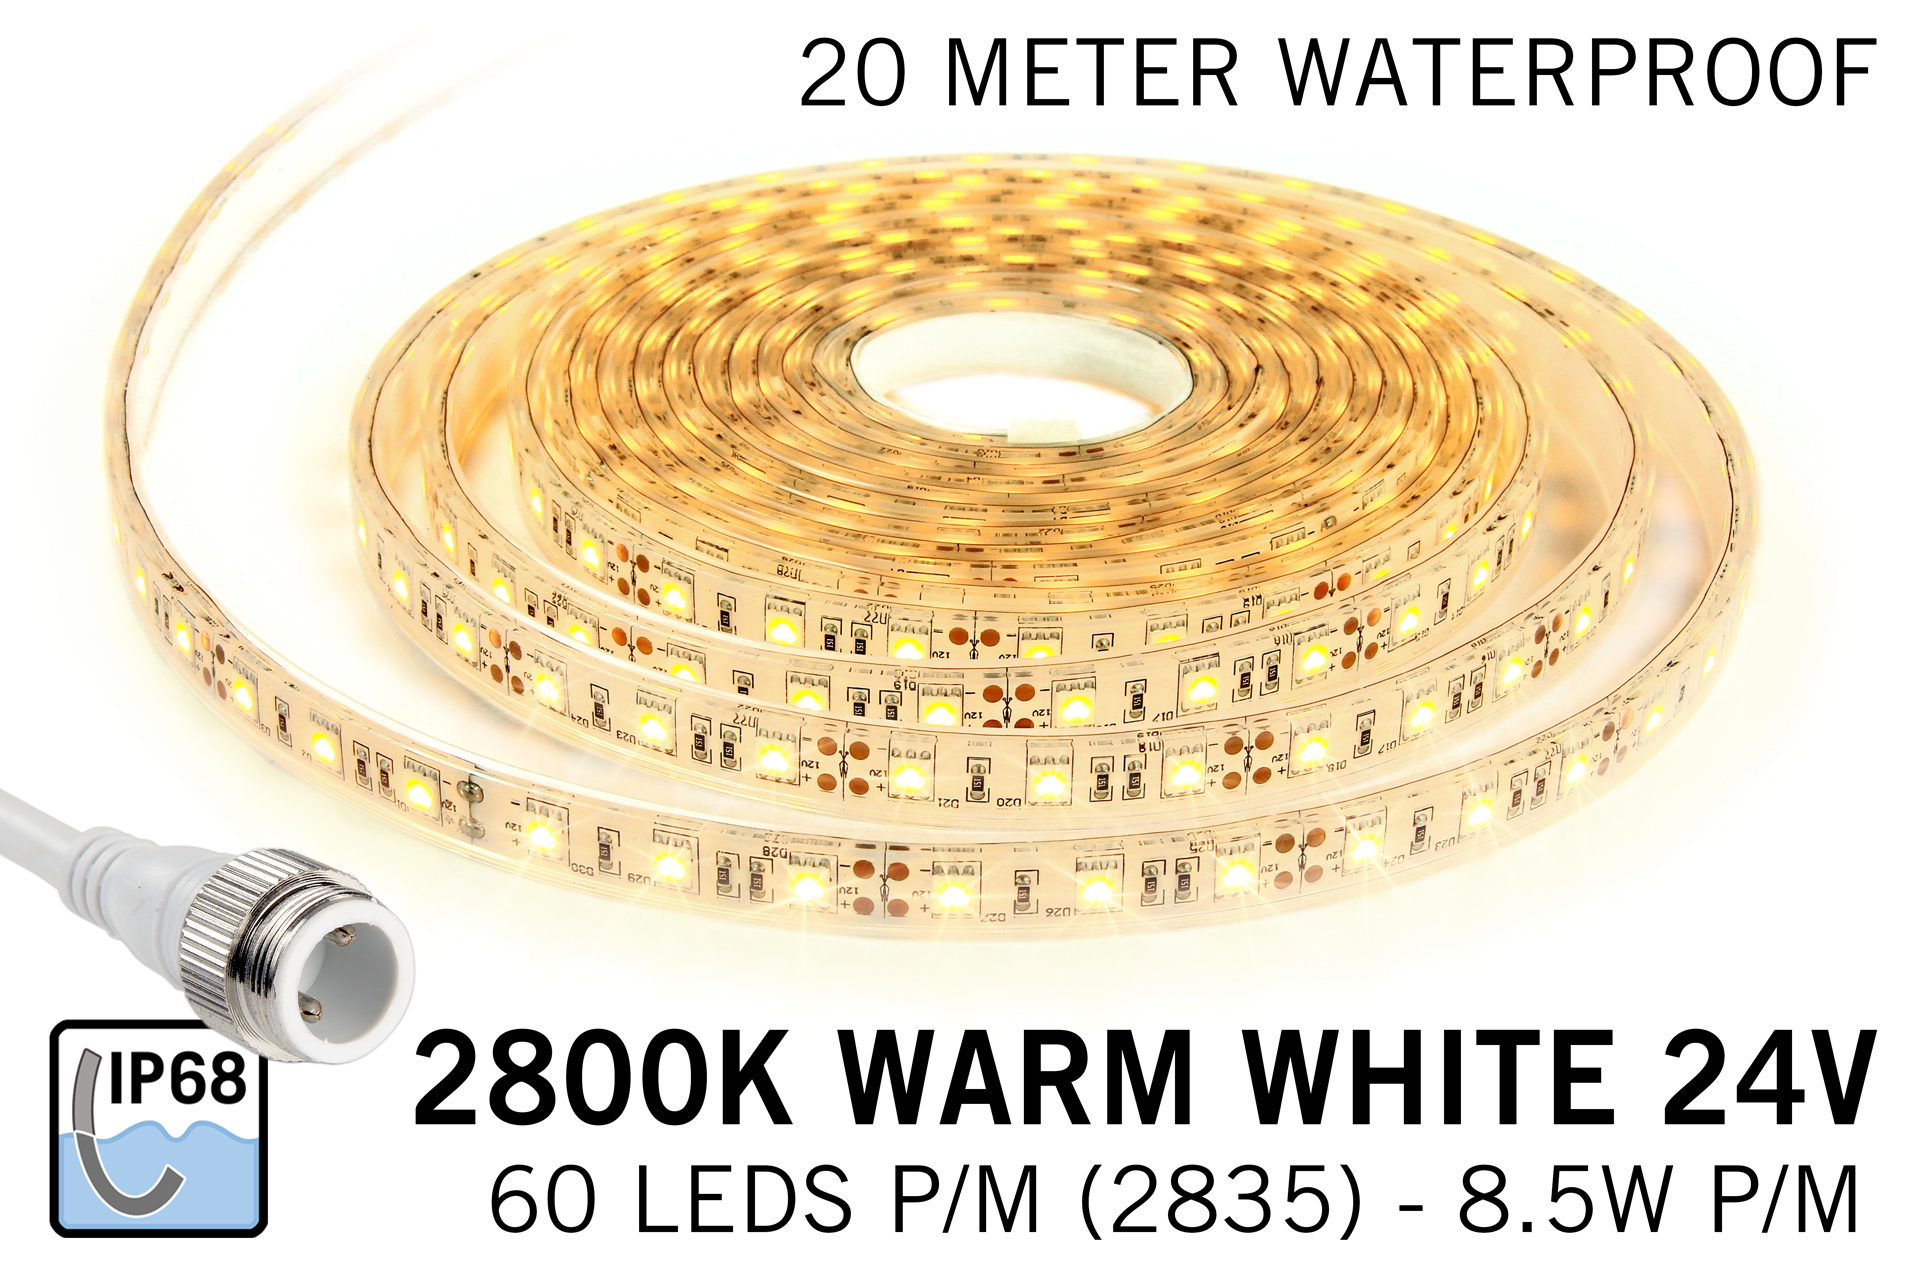 Warm Wit IP68 Waterdicht Led Strip | 20m 60 Leds pm Type 5050 Losse Strip